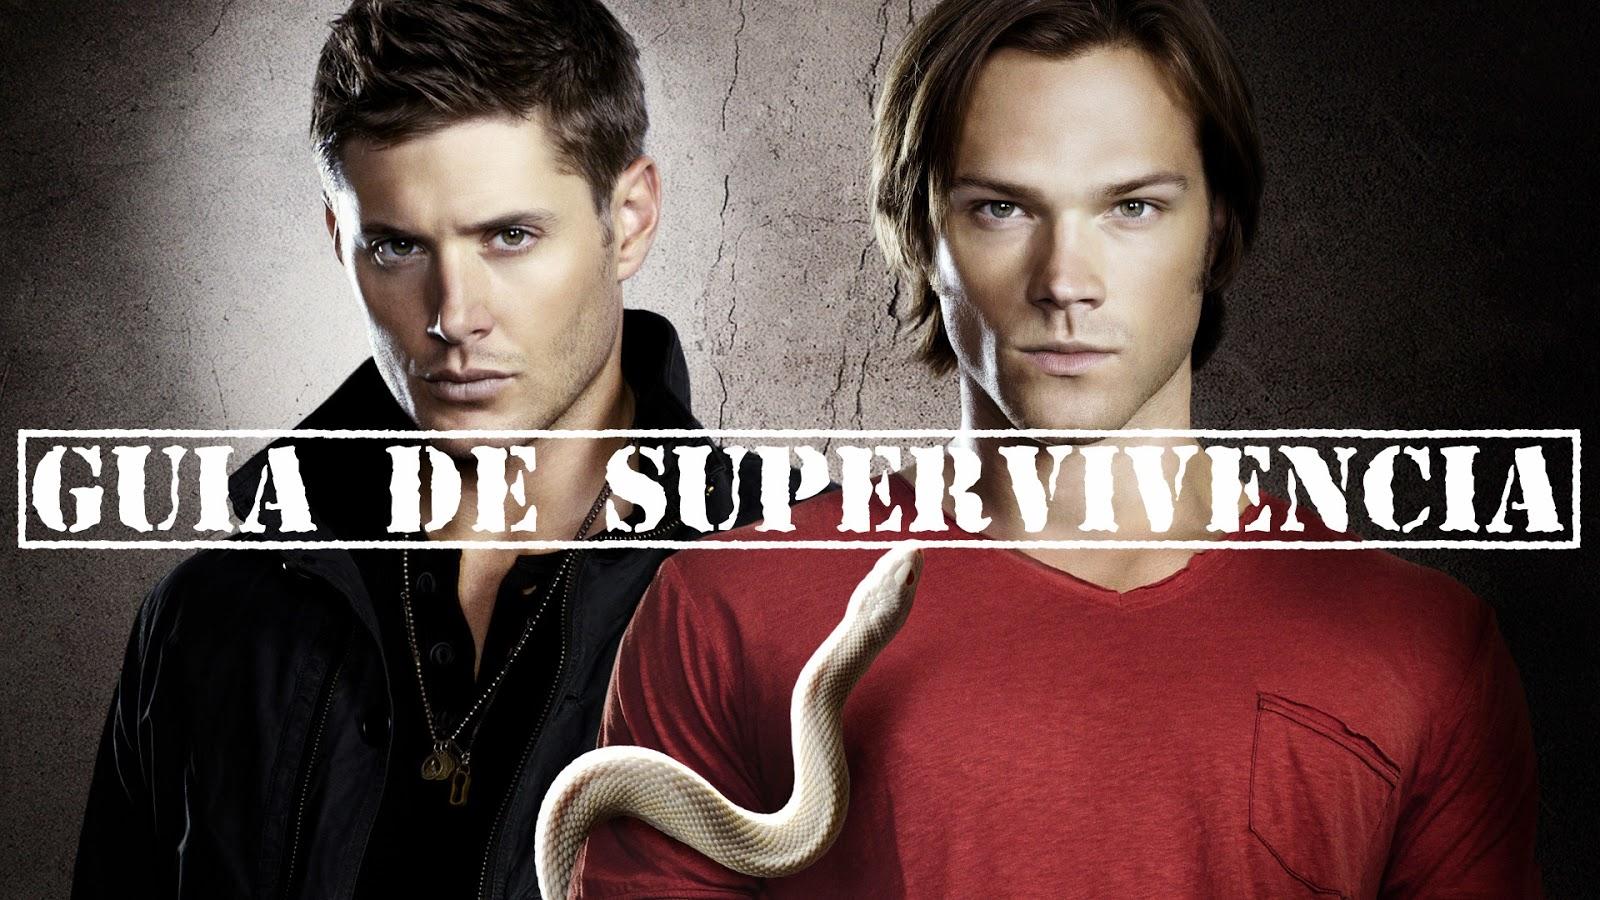 Supernatural-Sobrenatural-Guía-Supervivencia-Vampiros-Brujas-Fantasmas-Demonios-Ángeles